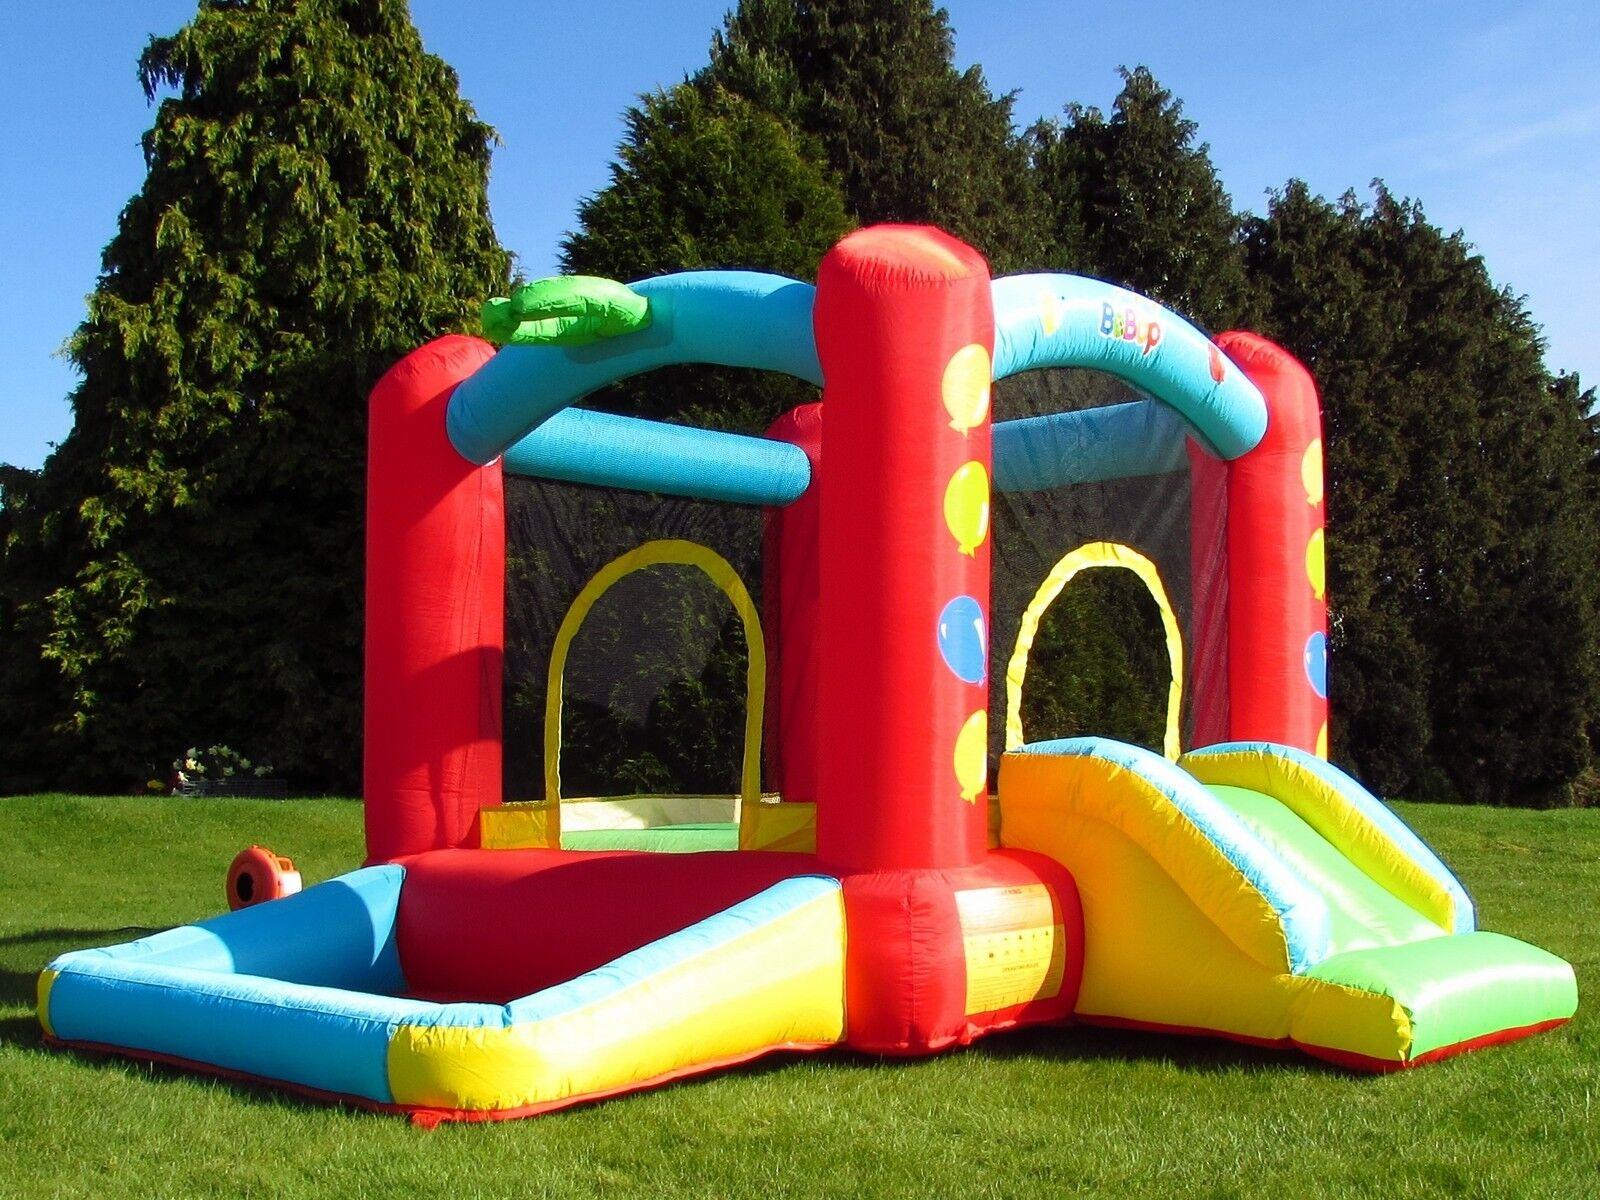 Castello Gonfiabile BeBop Balloon con Vasca Palline per Bambini